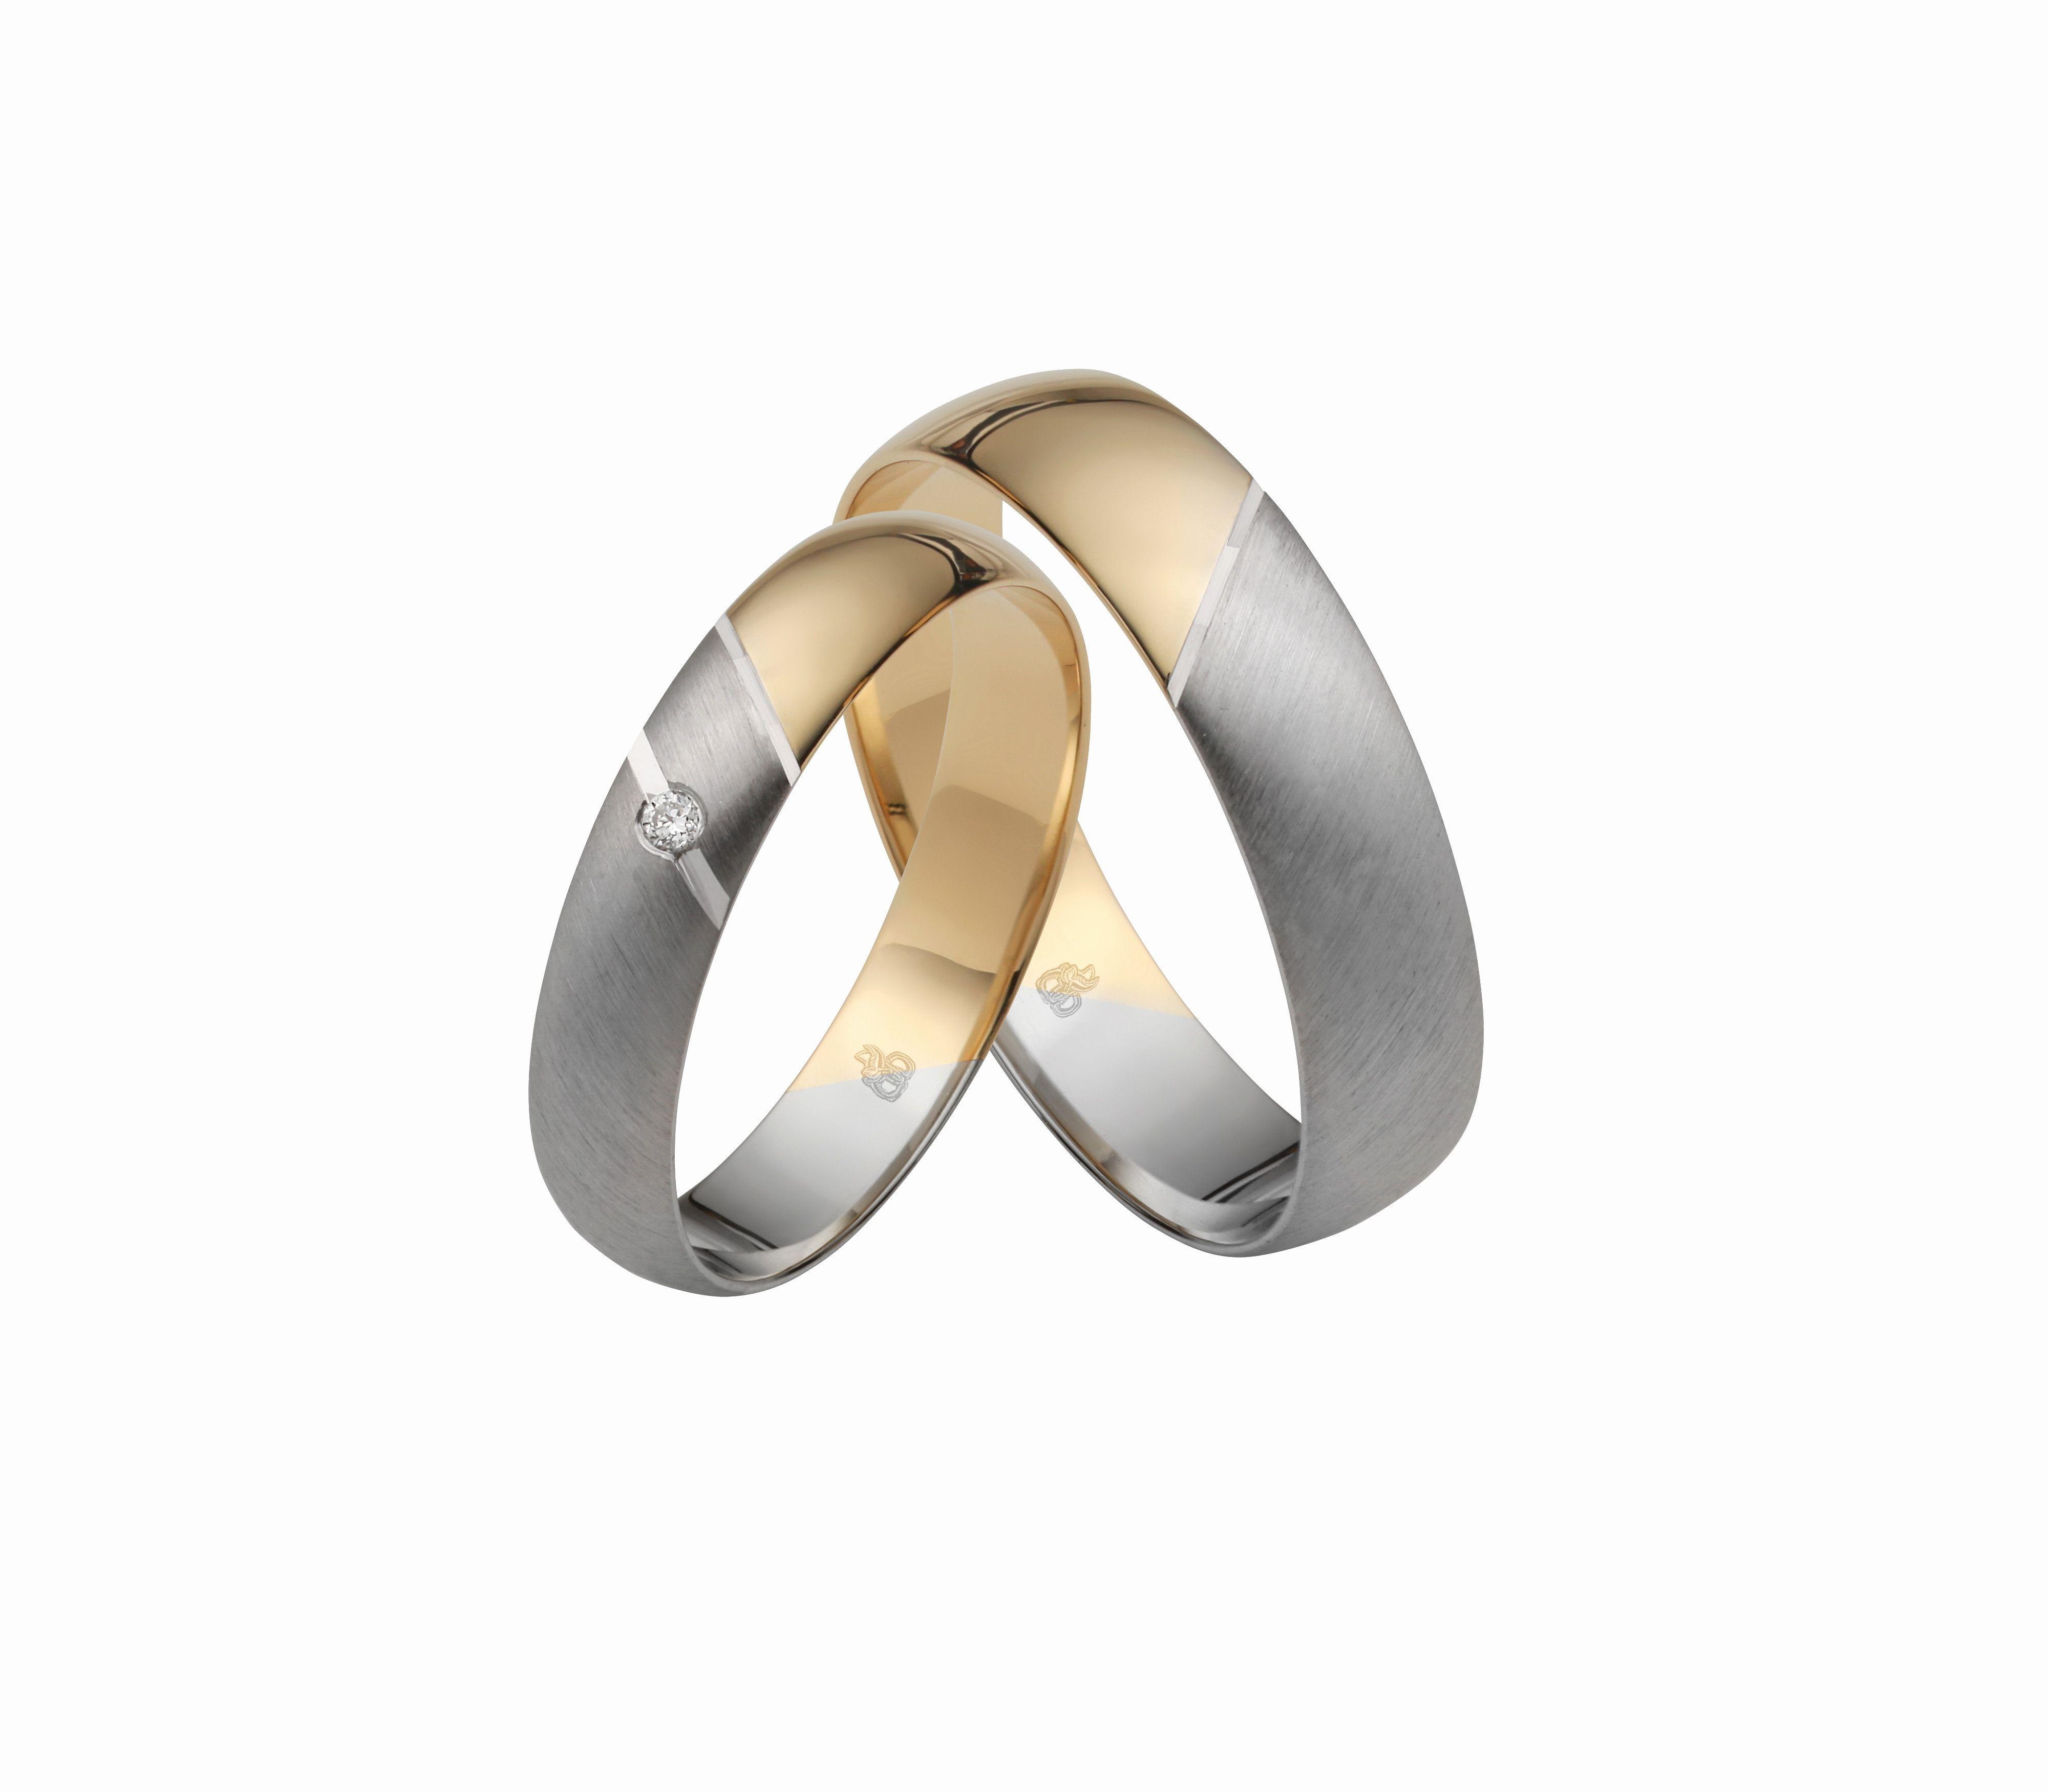 Pin by Hendro birowo on elegant wedding ring sets